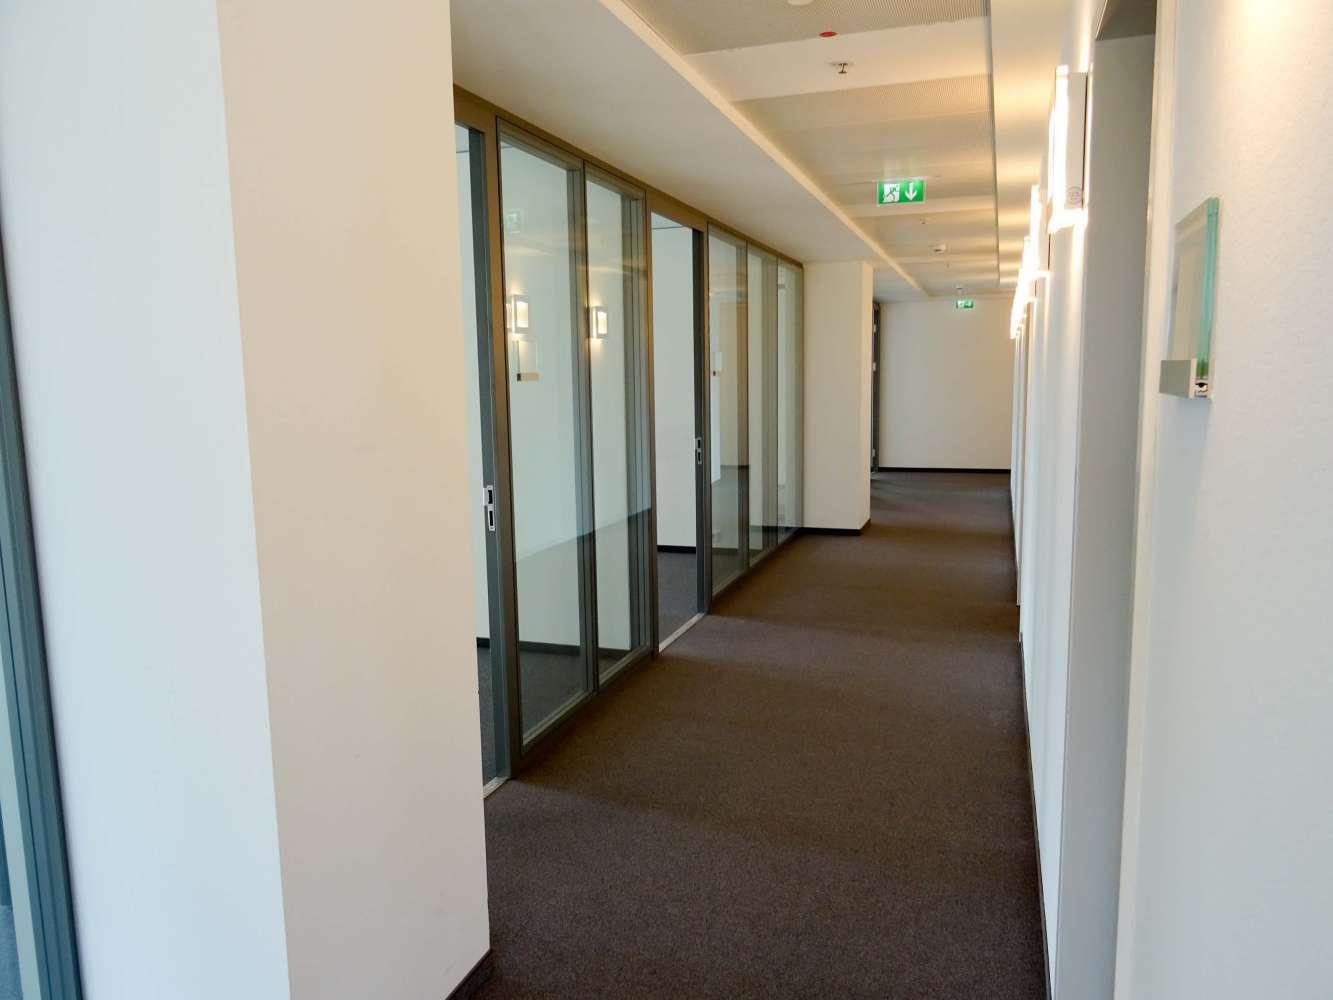 Büros Frankfurt am main, 60325 - Büro - Frankfurt am Main, Westend-Süd - F0995 - 10530001